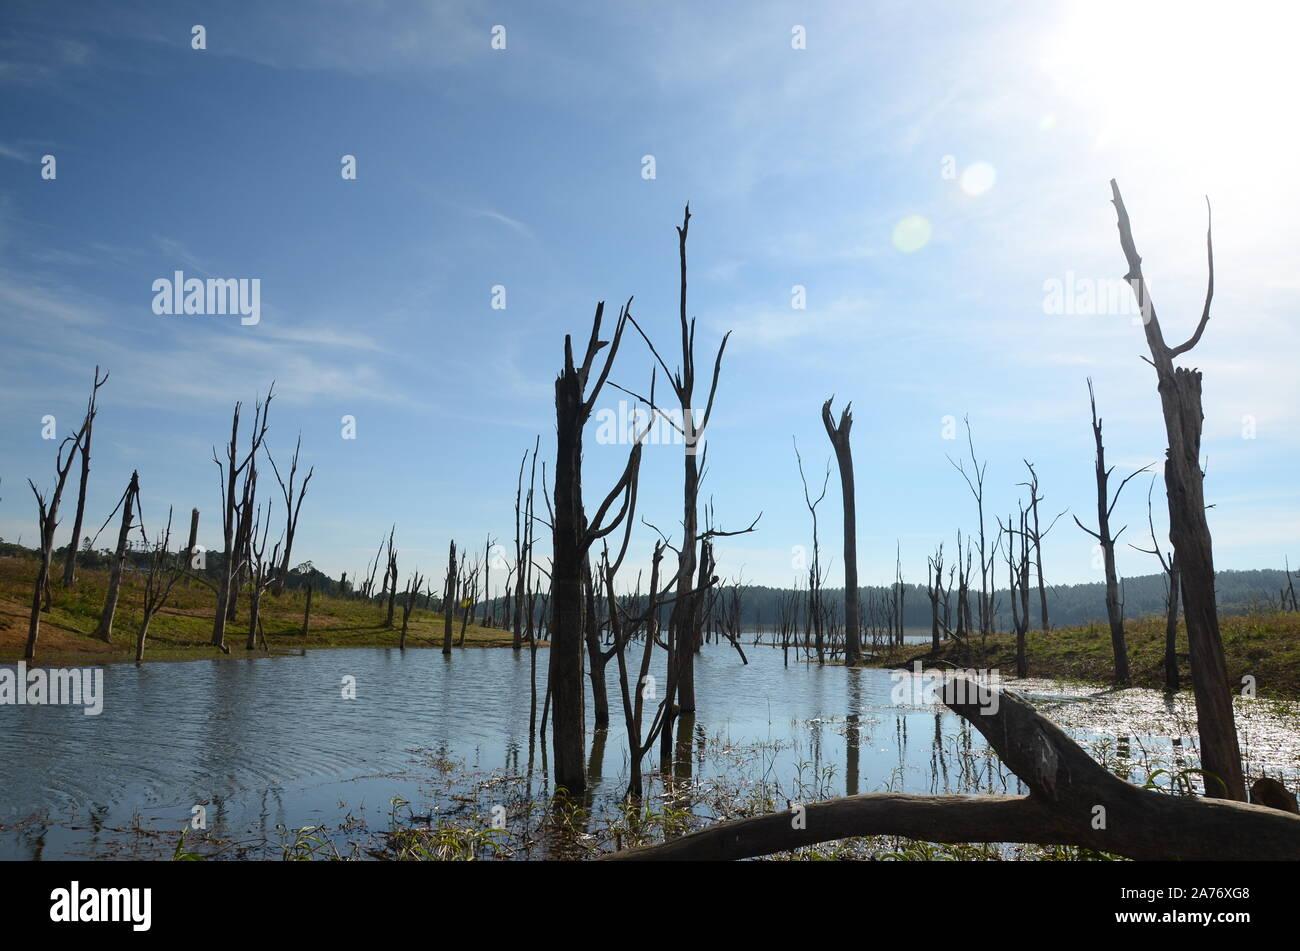 tidal surge, flood zone Stock Photo